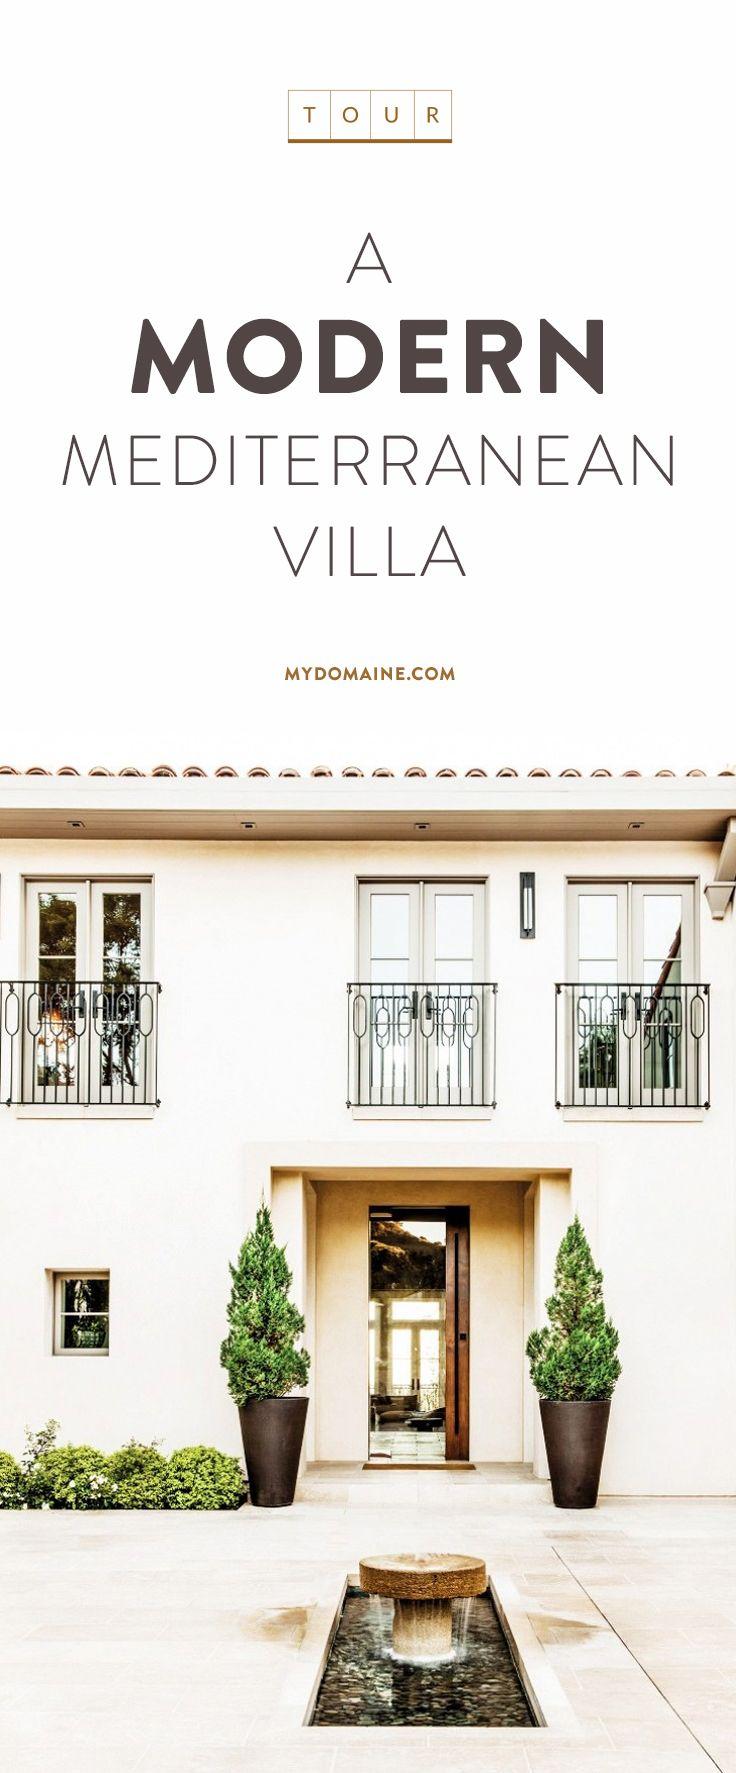 211 best house color images on Pinterest | Dream homes, Dream houses ...